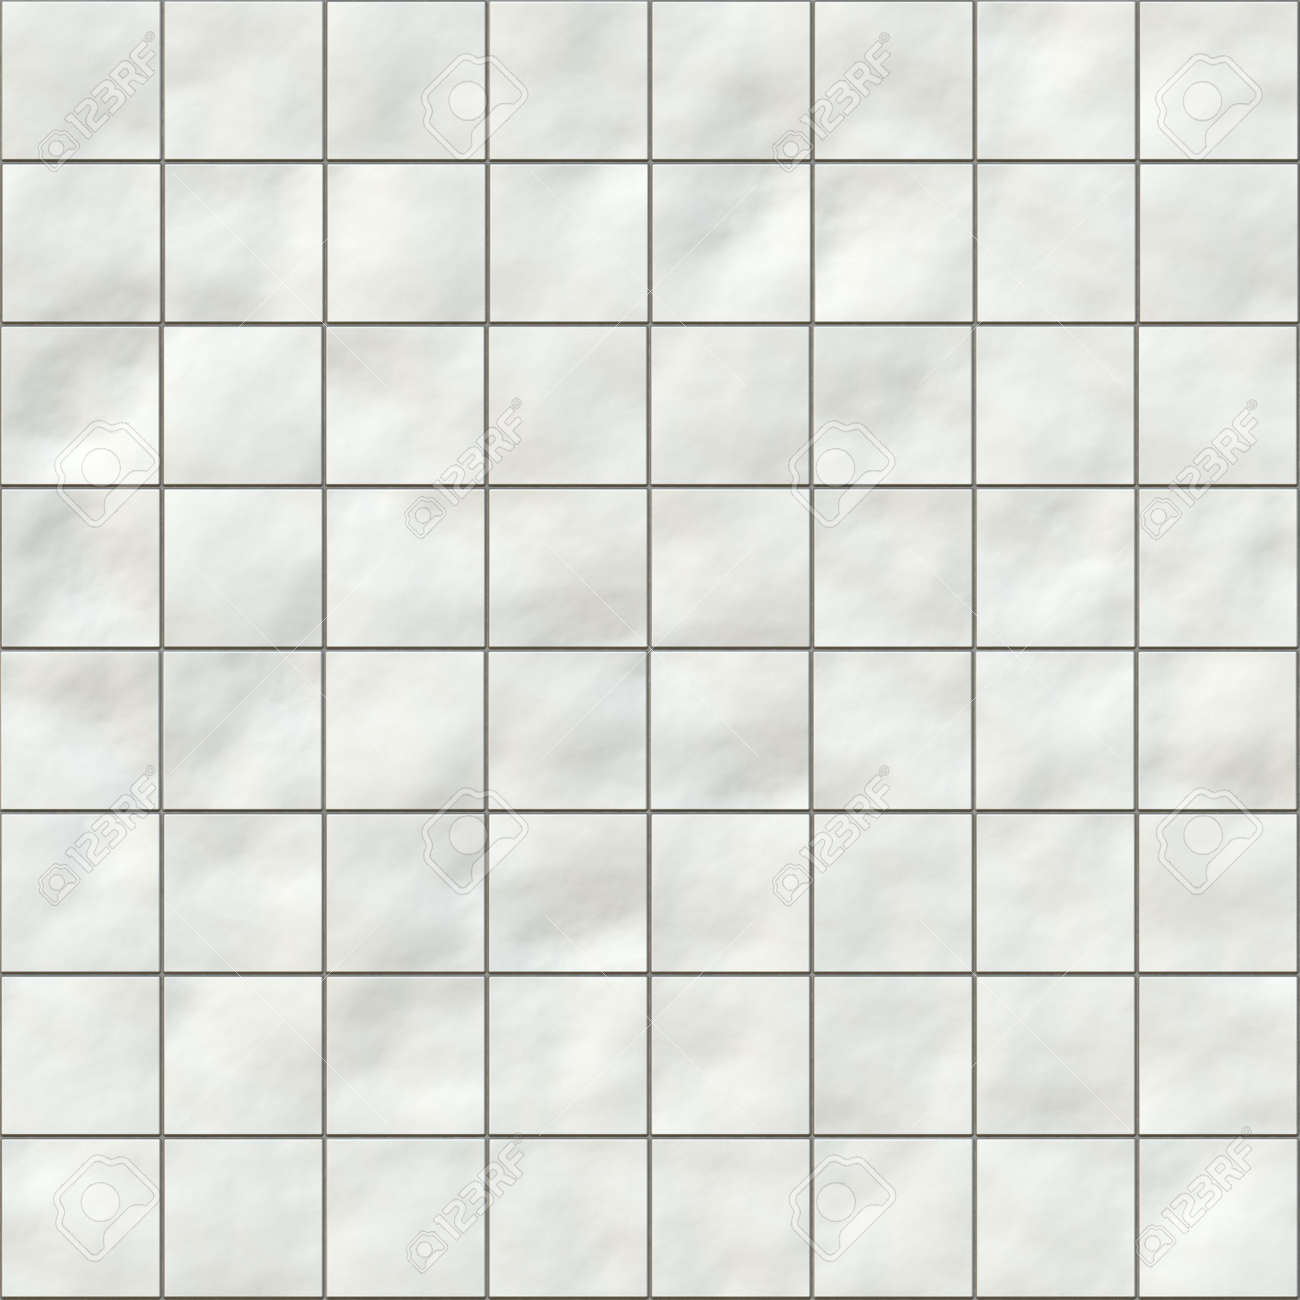 Bathroom Tile Texture plain white bathroom tile texture amazing floor texturejpg t with